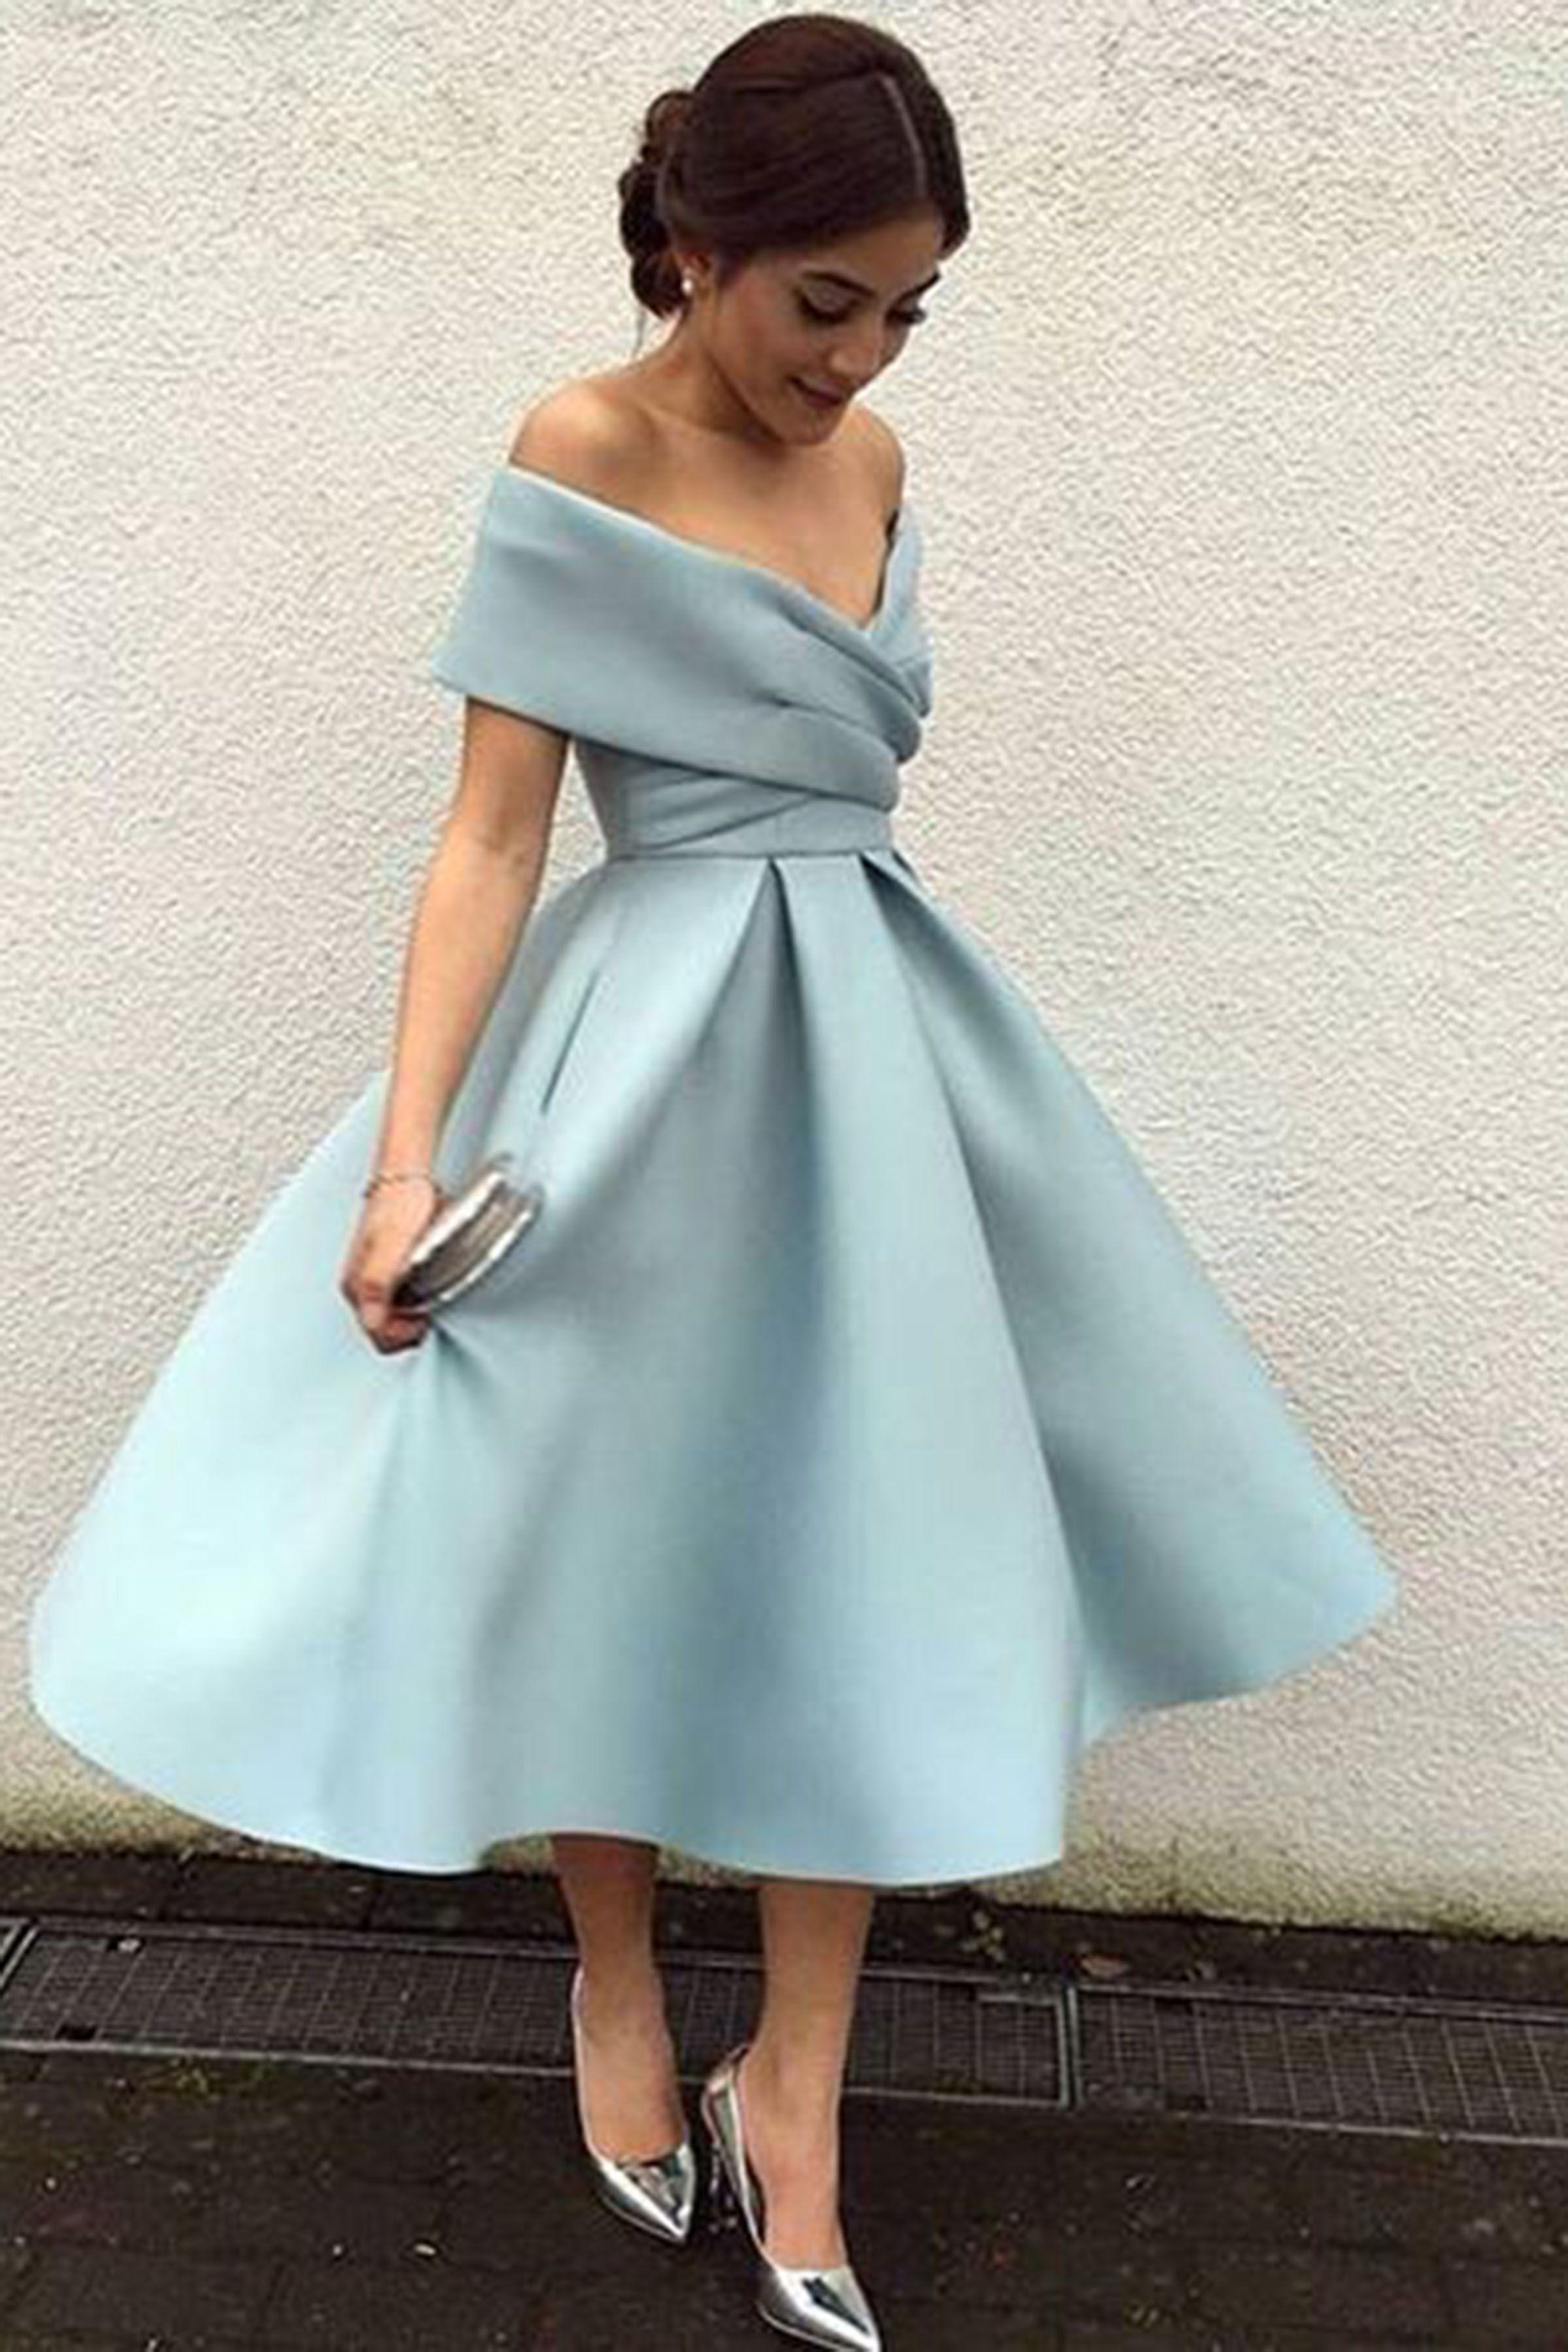 Offshoulder prom dress ball gown elegant light blue chiffon prom